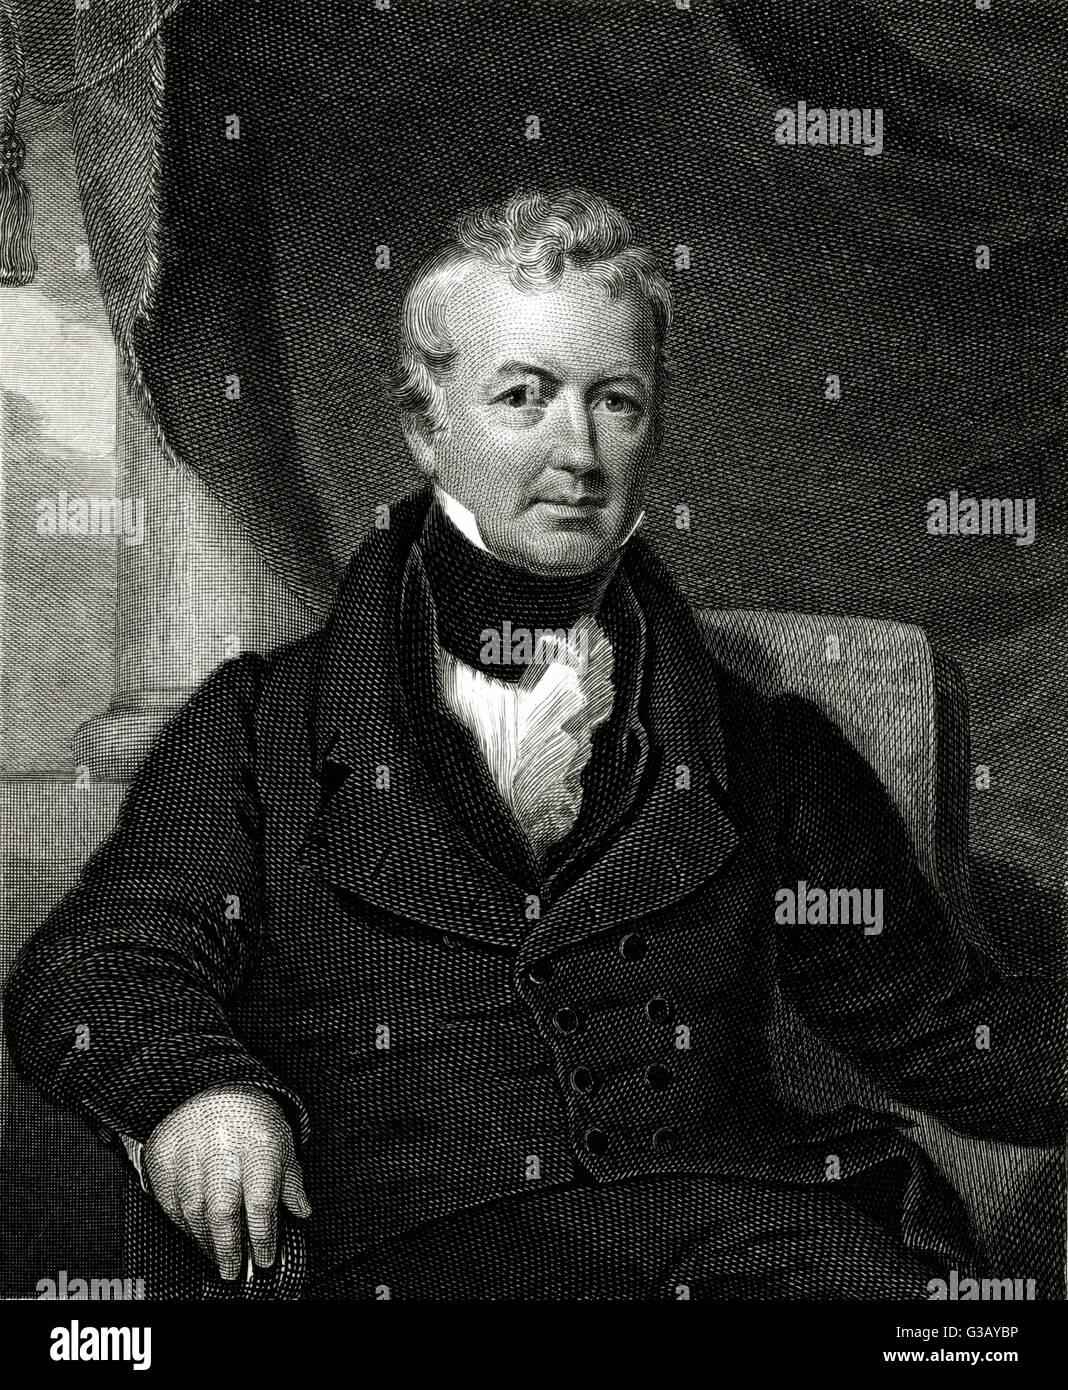 WILLIAM GASTON  American jurist        Date: 1778 - 1844 - Stock Image